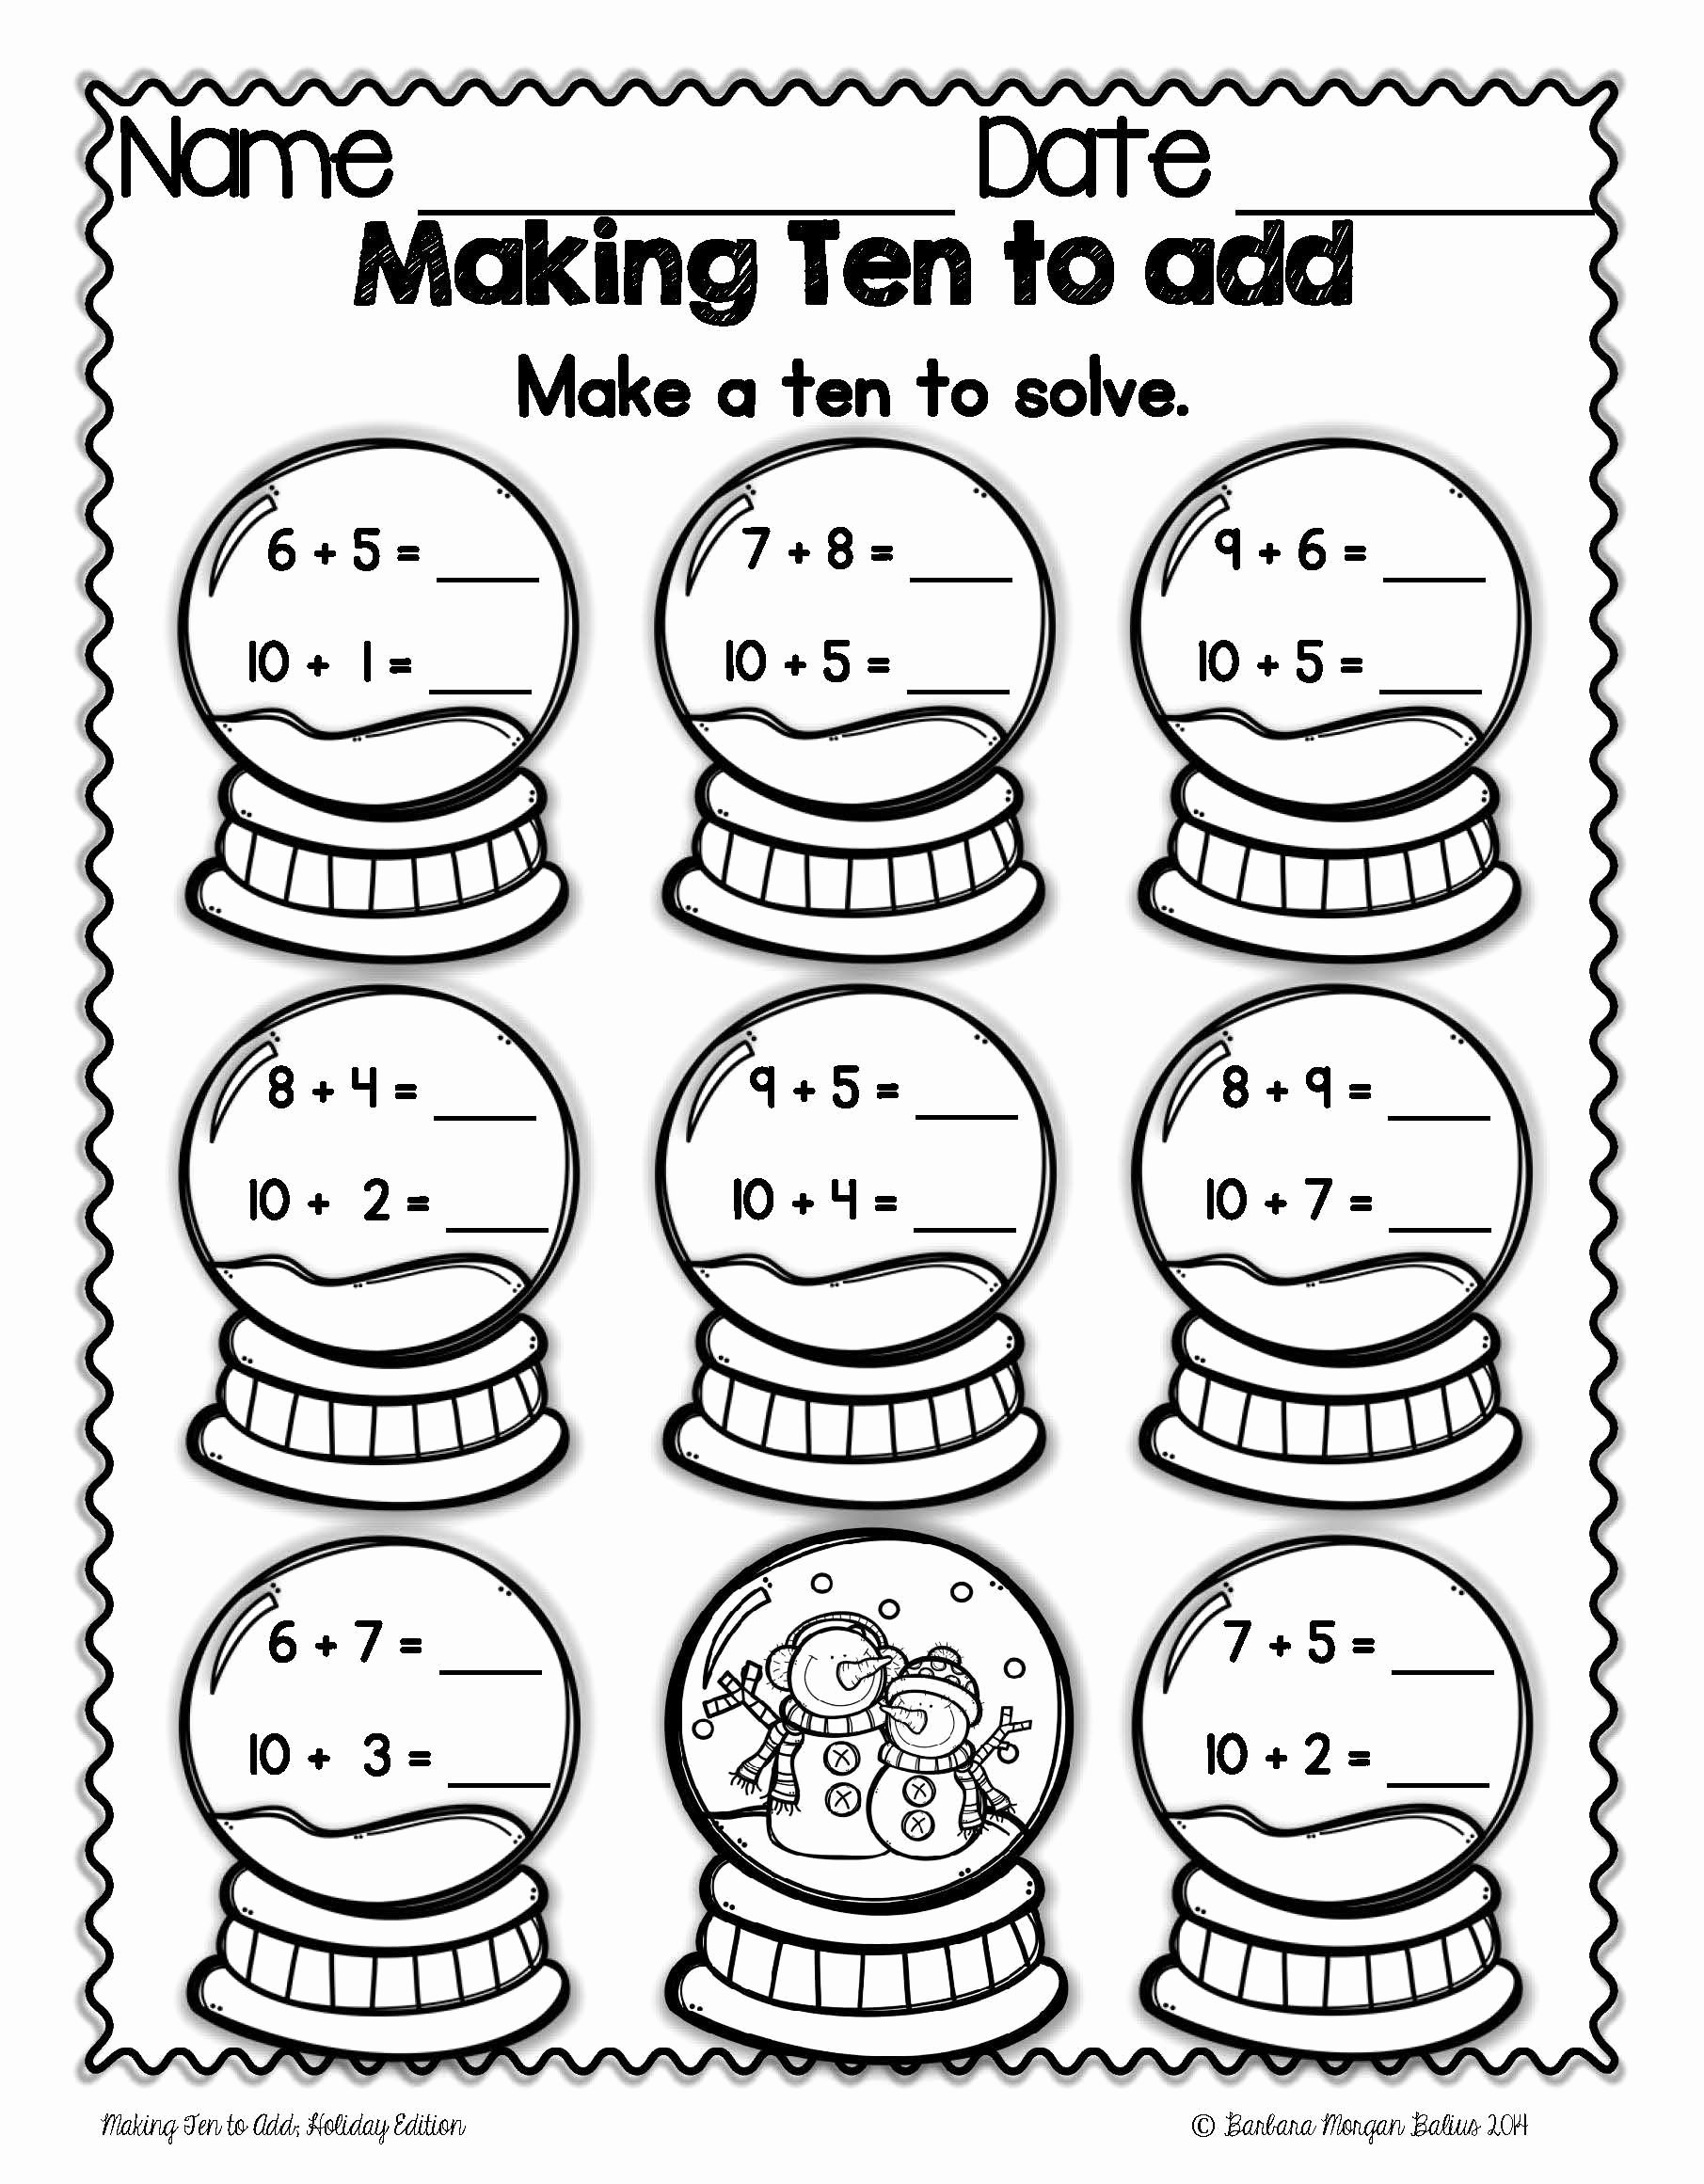 Spring Math Worksheets for Preschoolers top Worksheets Worksheets Spring Math for 2nd Grade Second